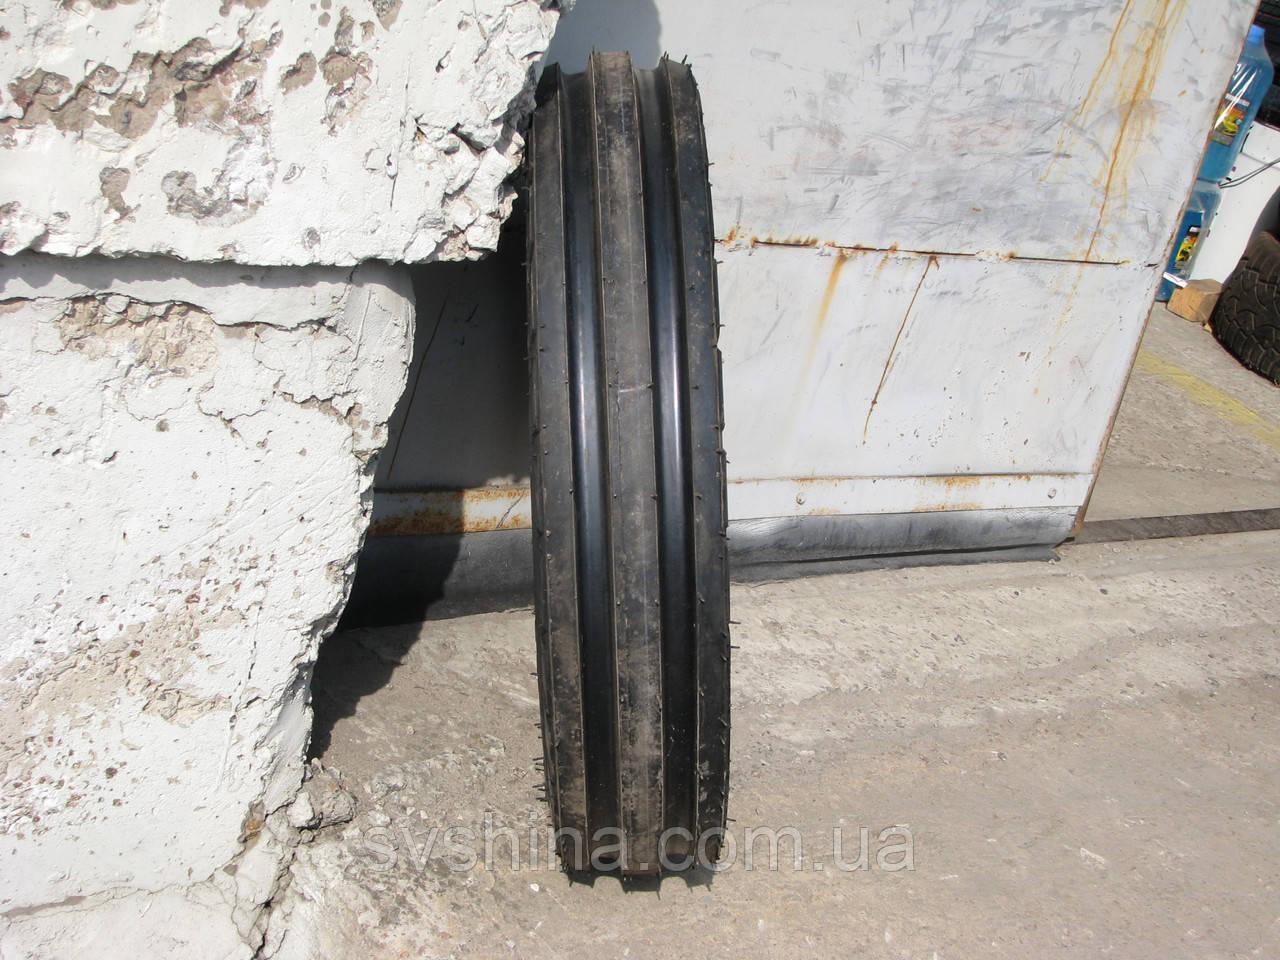 Сільгосп шини 6.50-16 (175-406) Алтайшина Я-275А (NorTec IM 15), 6 нс